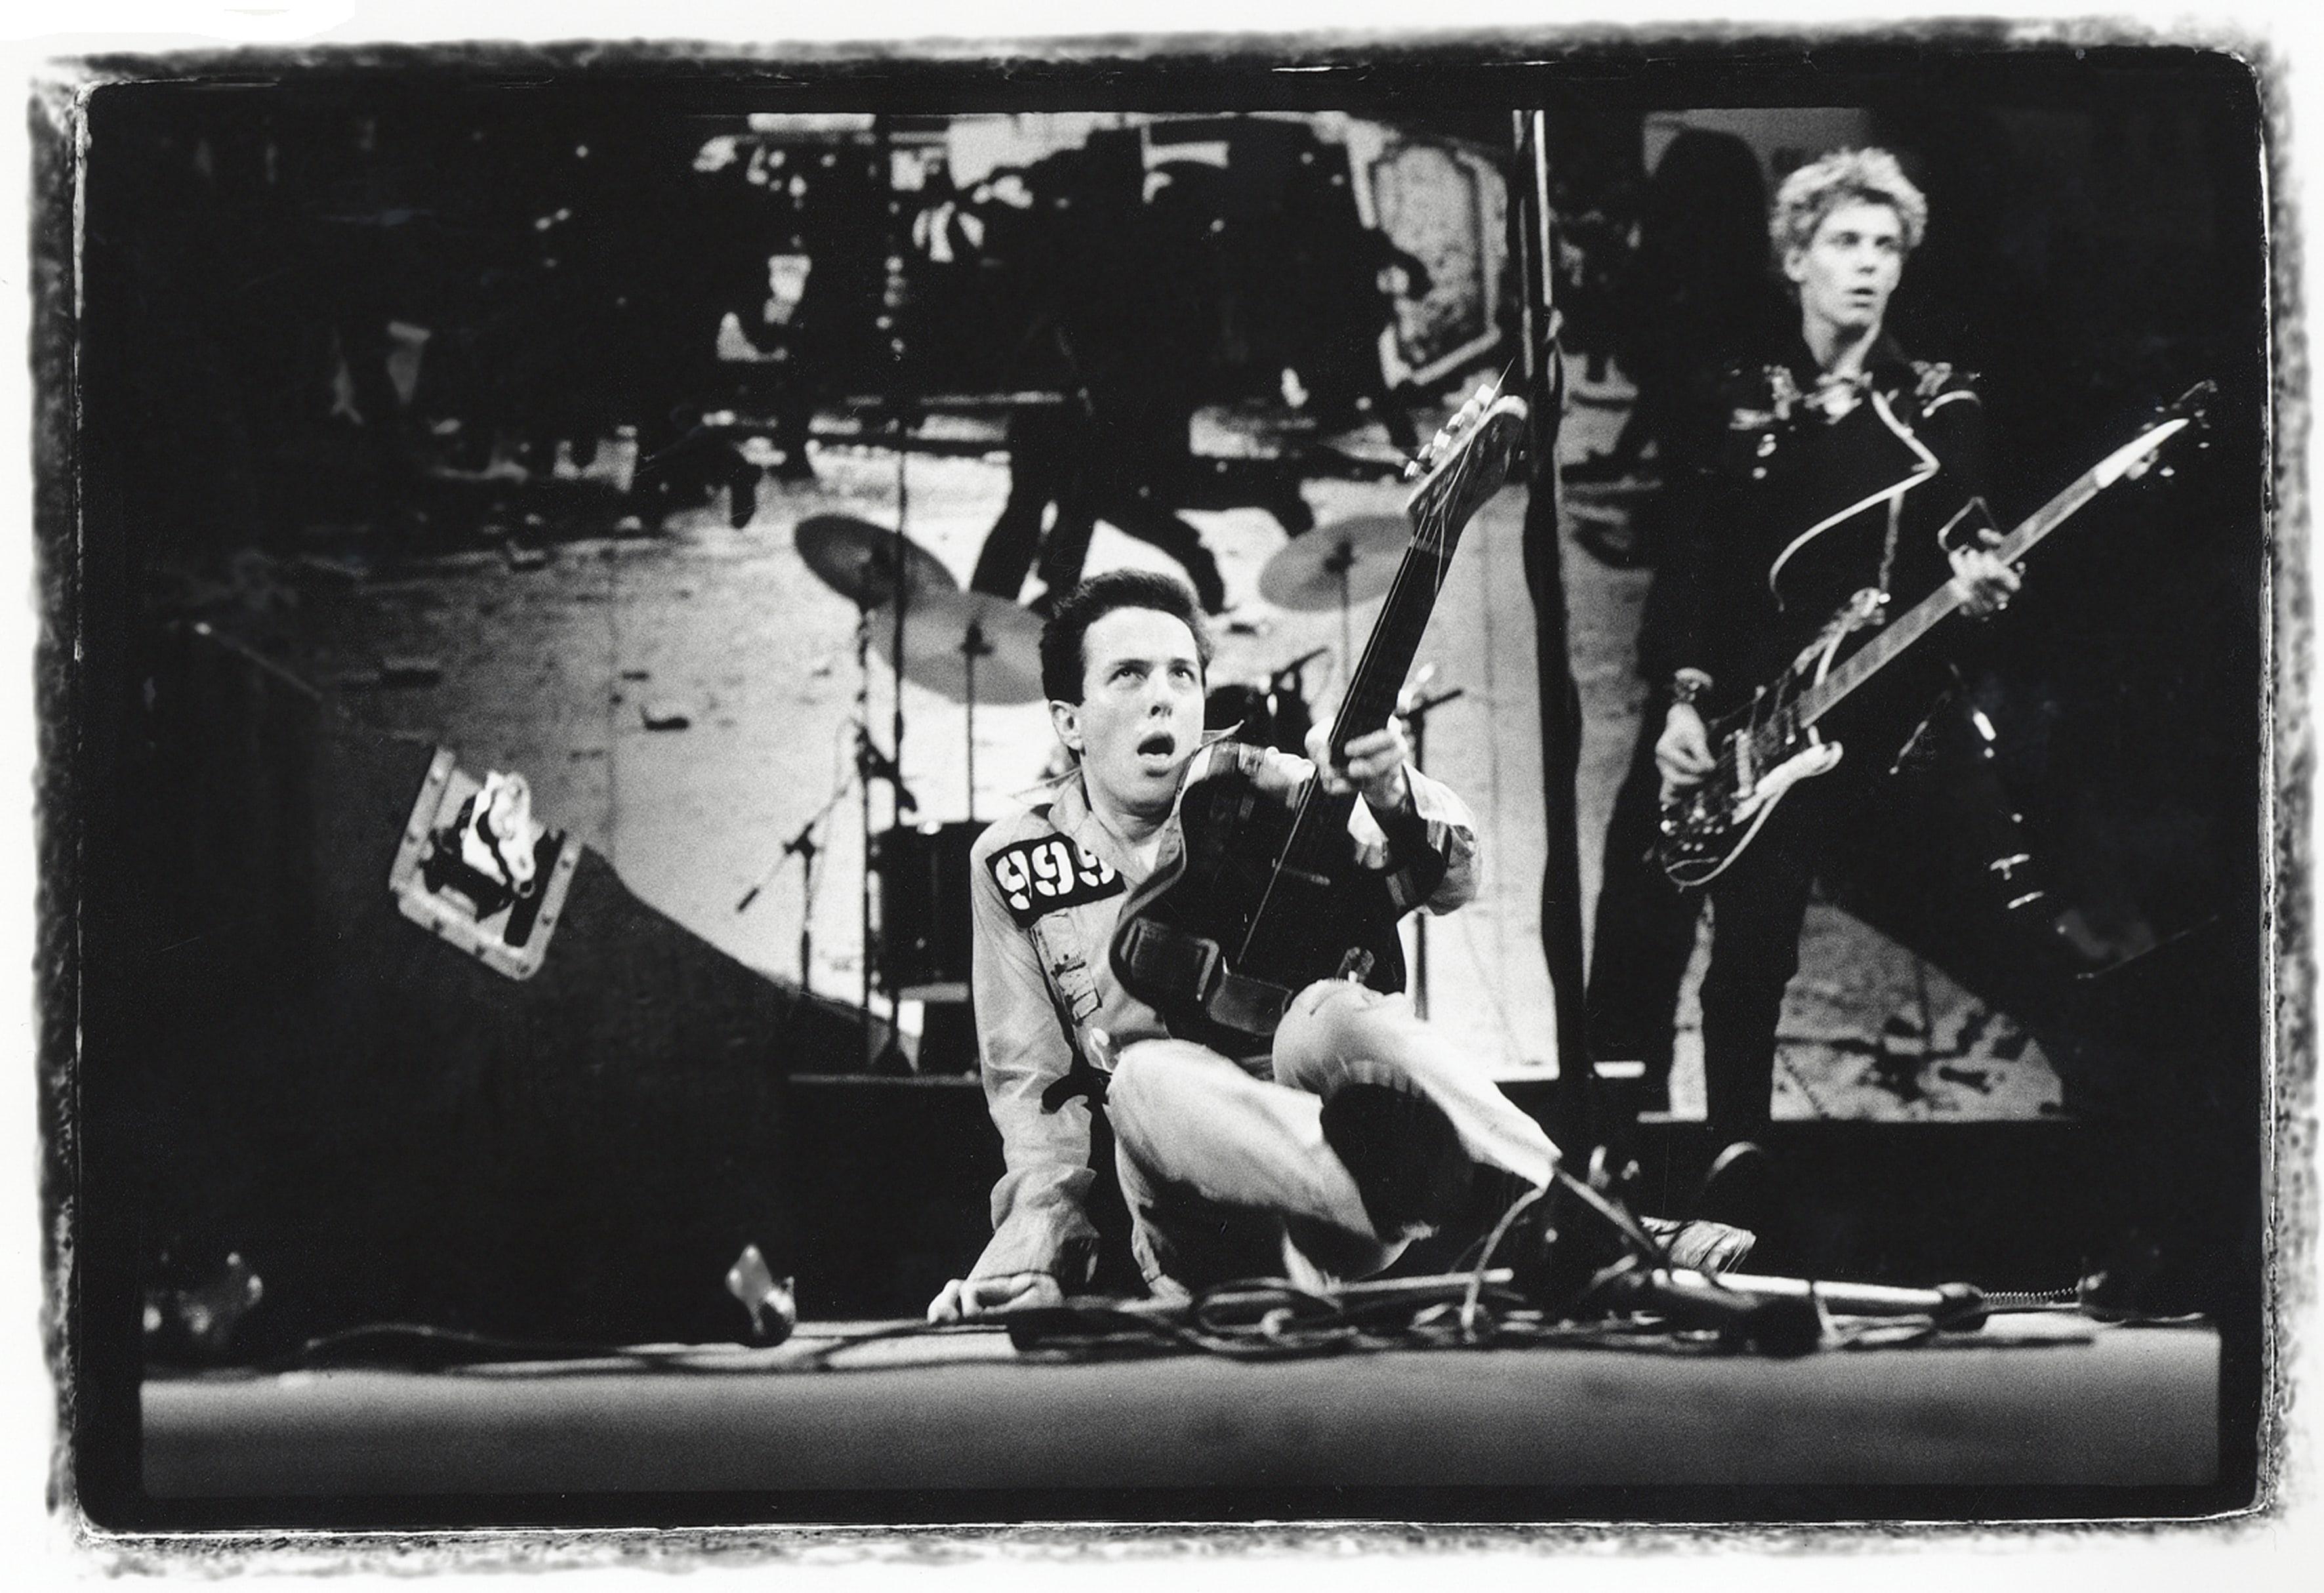 The Clash © Jill Furmanovsky/rockarchive.com